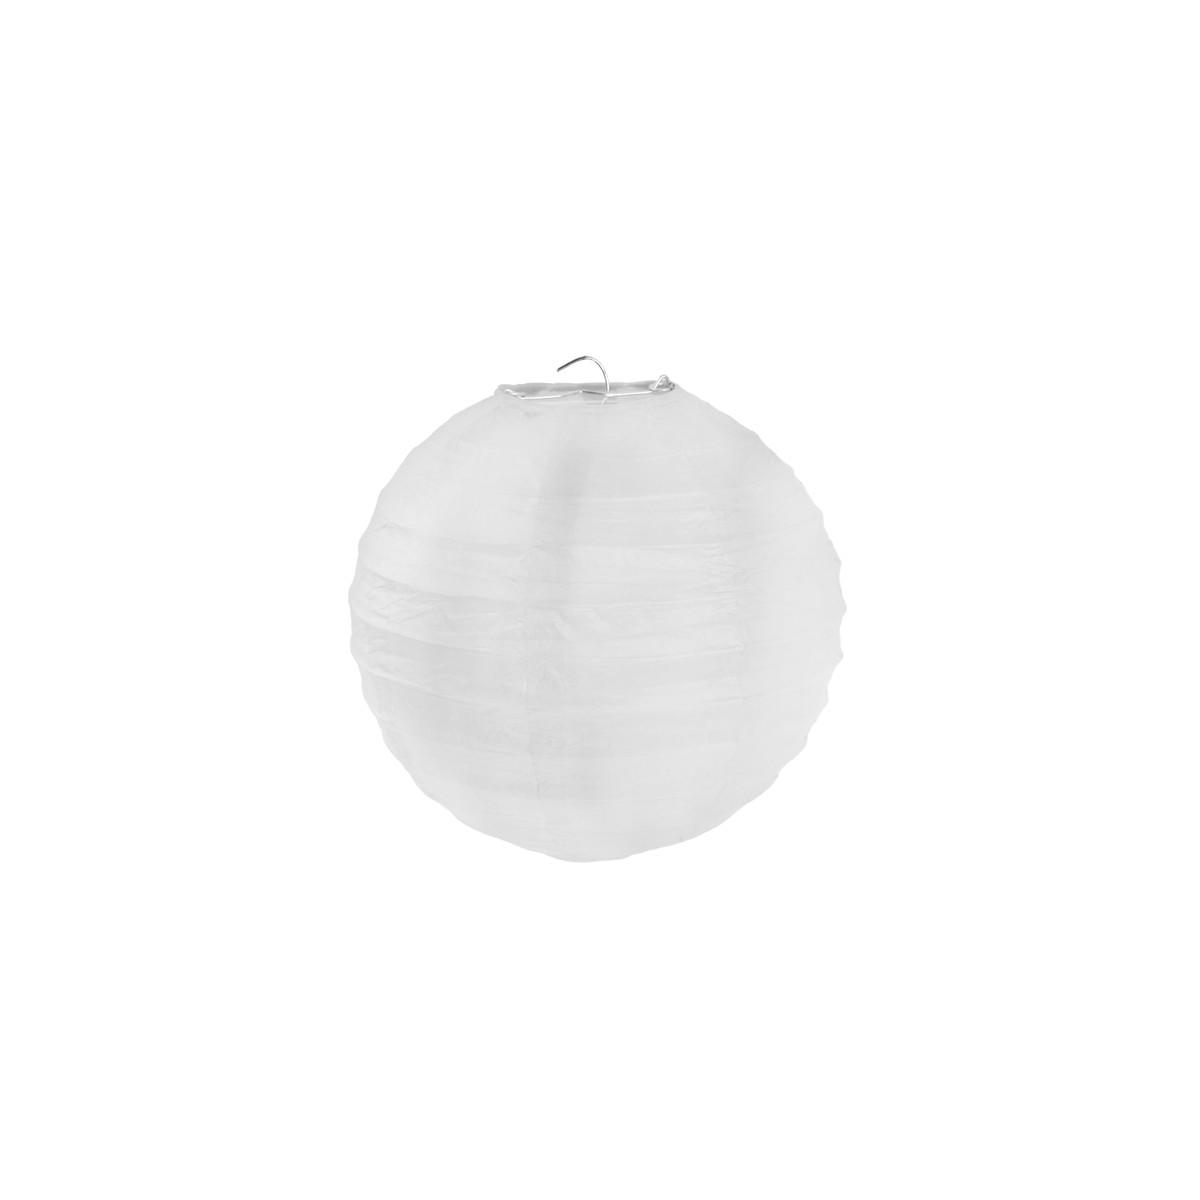 2x Lanterne Papier 30cm - Blanc